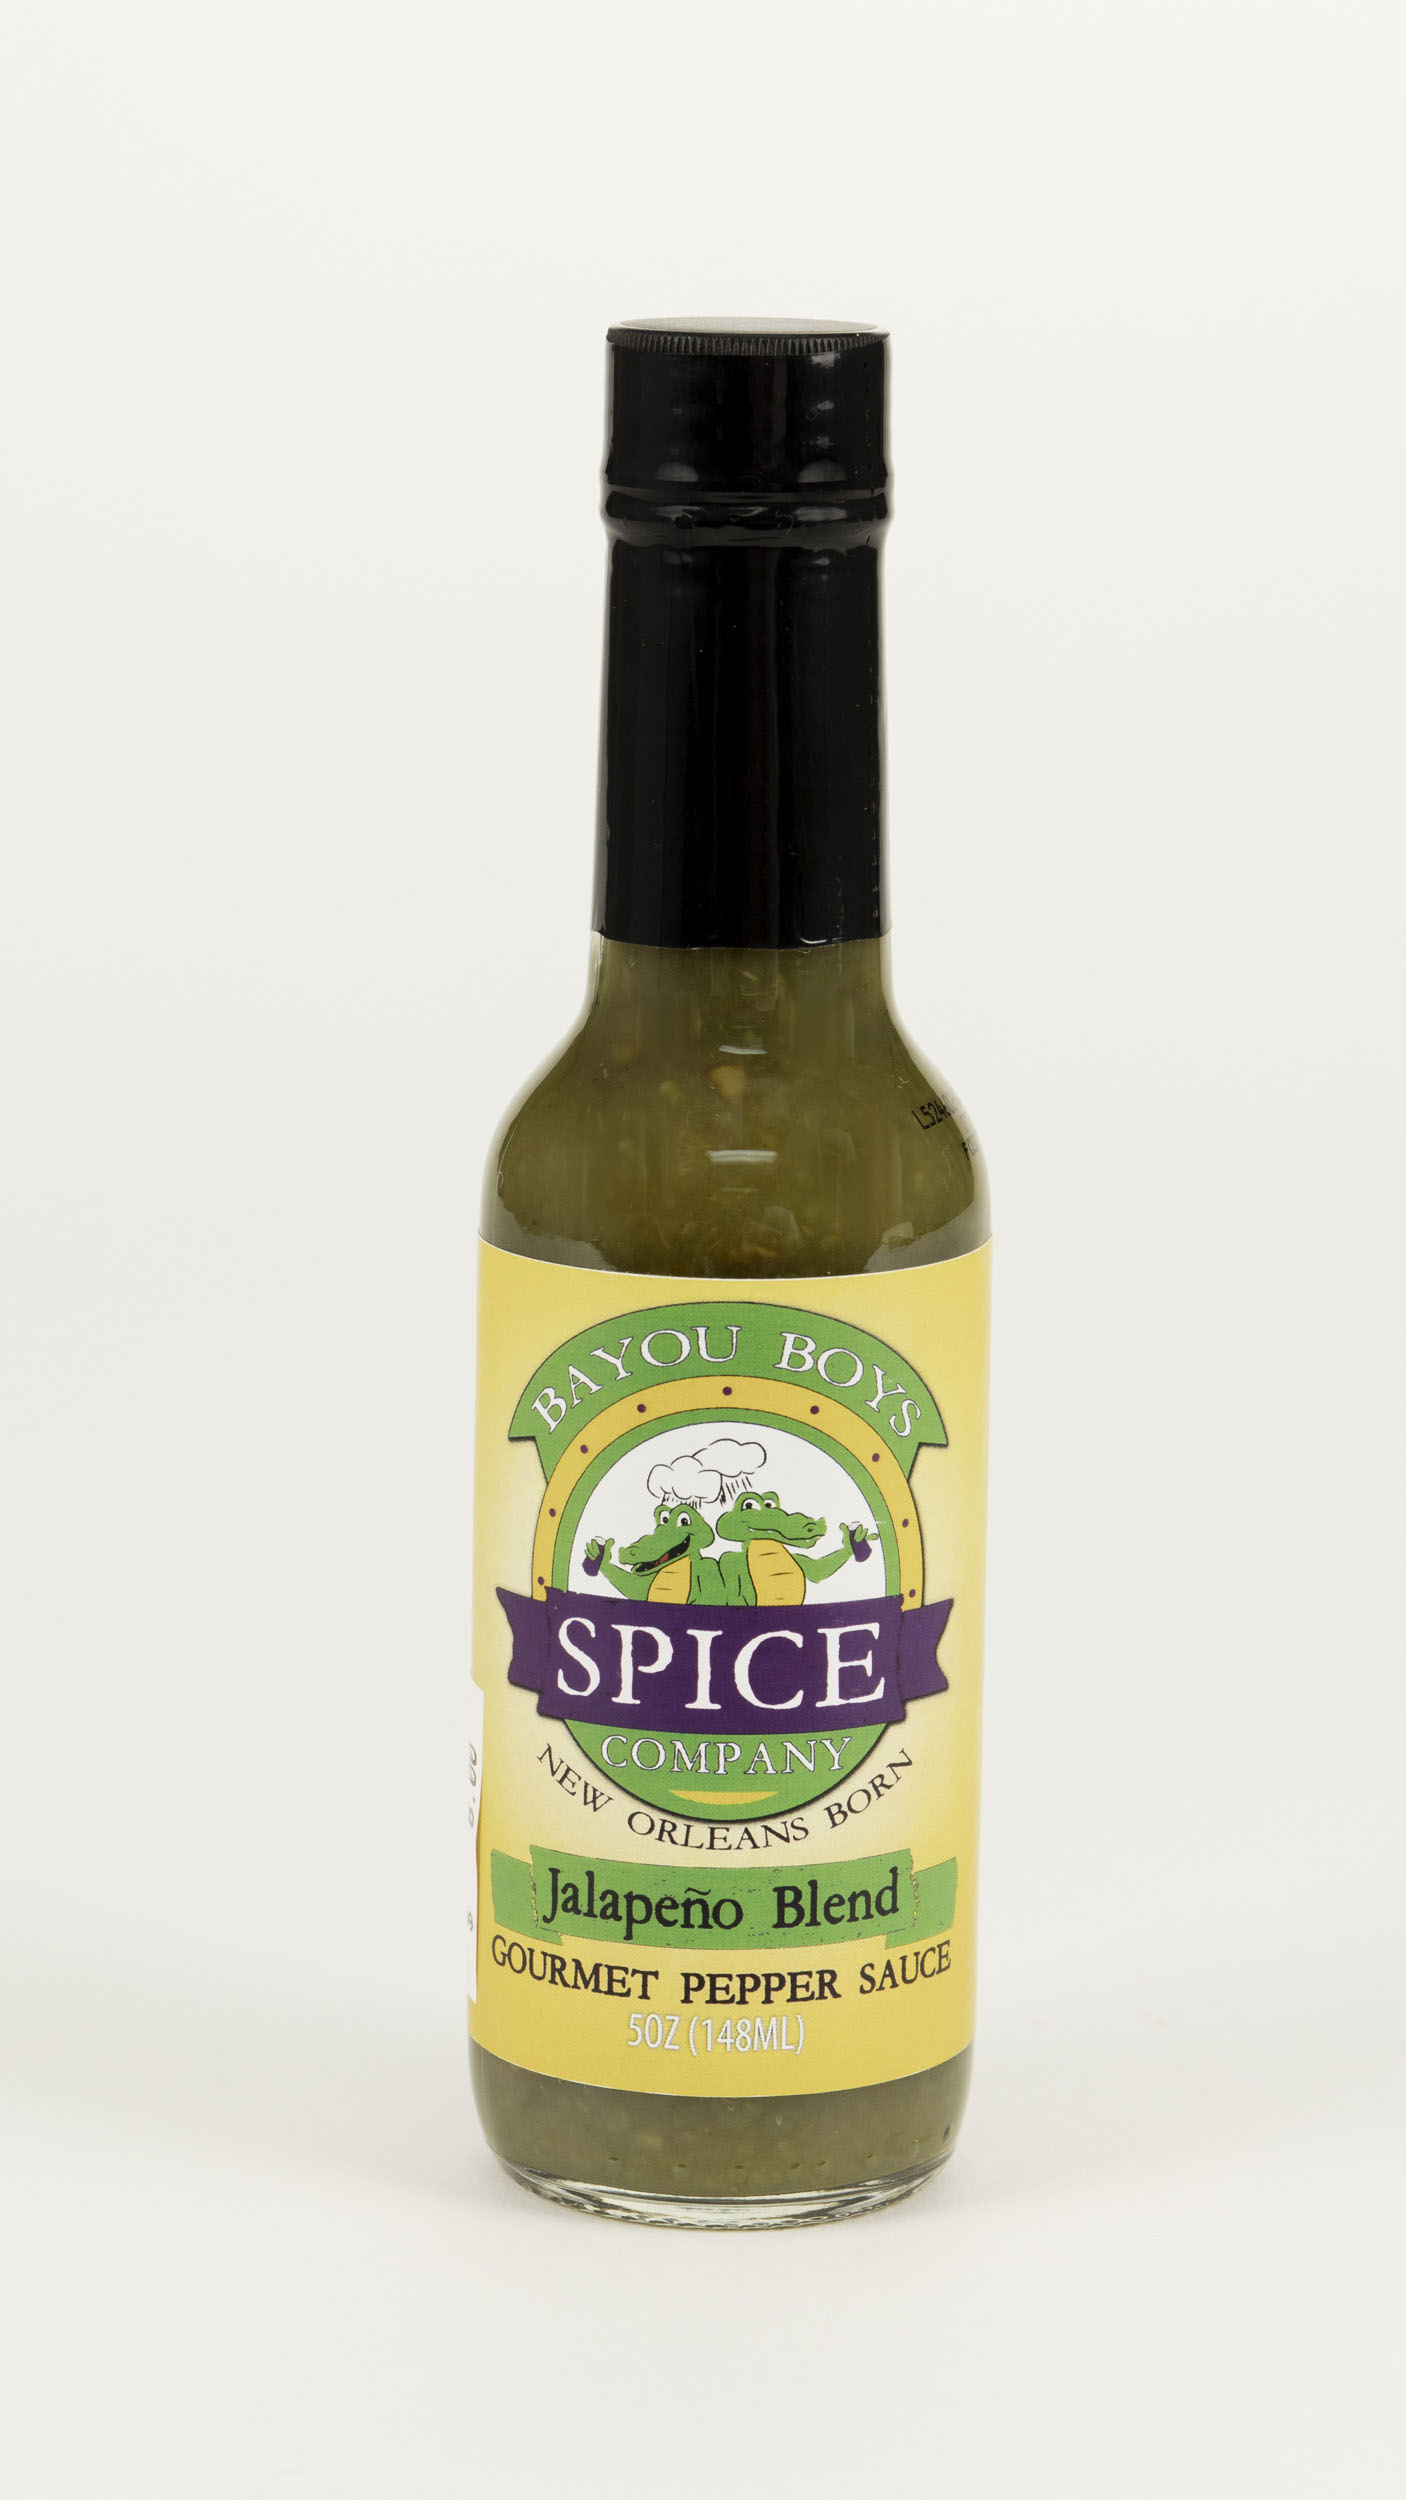 Bayou Boys Jalapeno Blend Pepper Sauce,20150